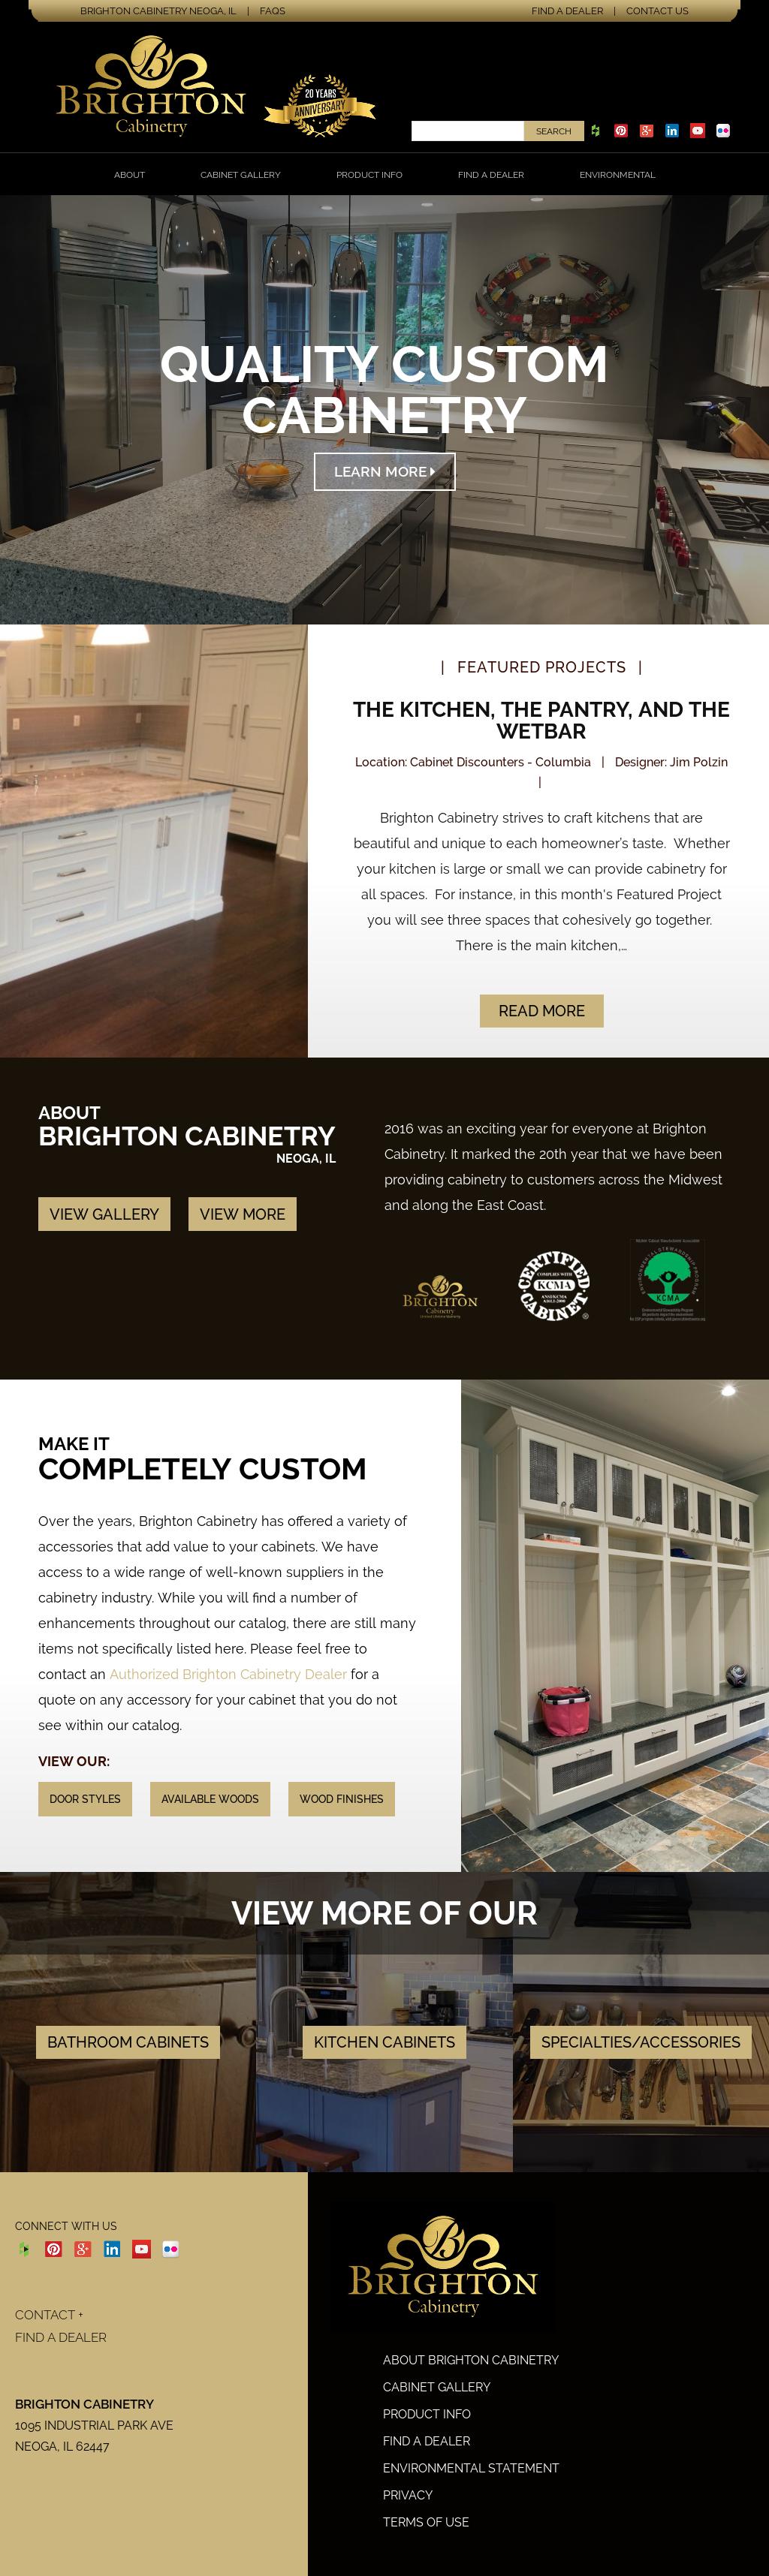 Brighton Cabinetry Website History